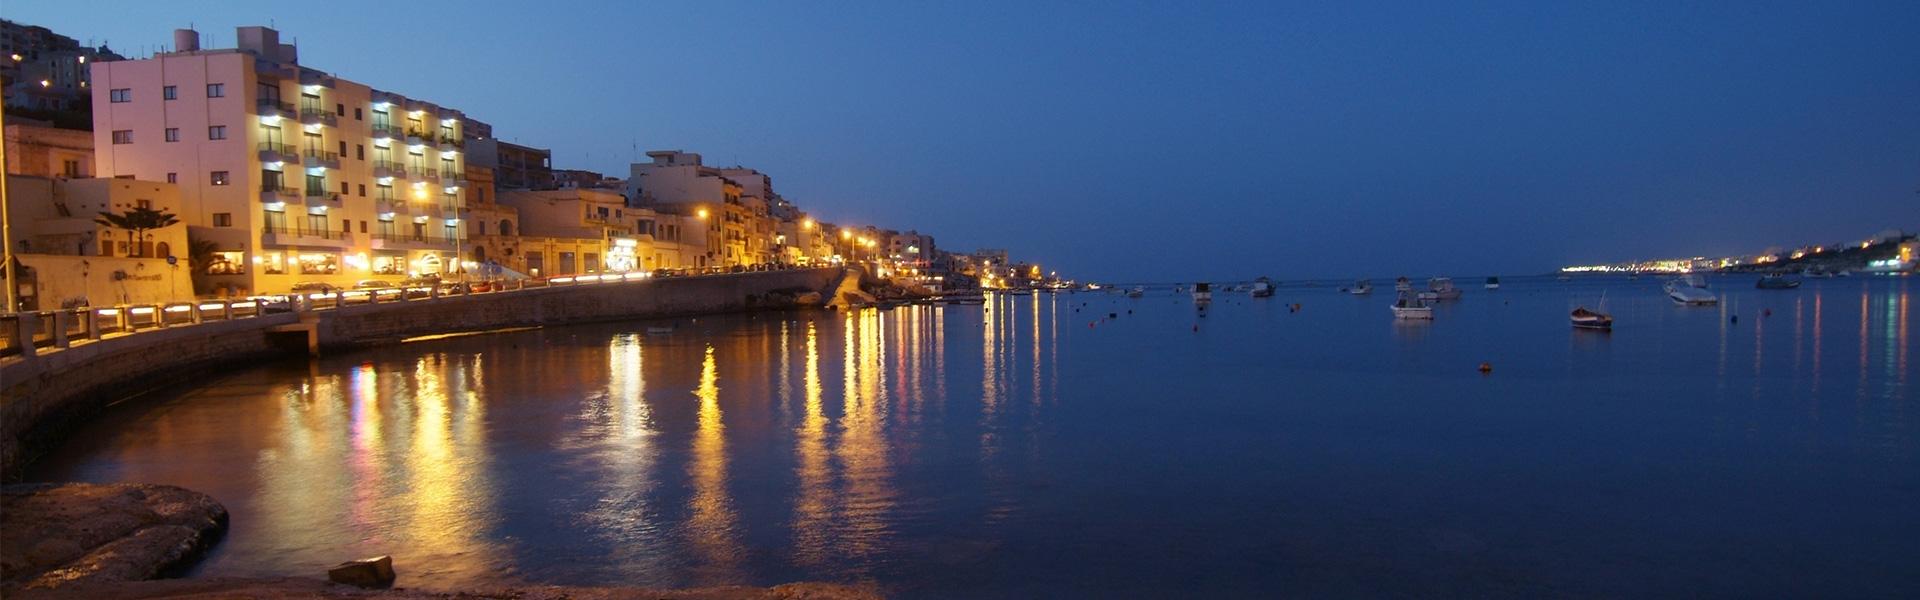 http://portoazzurro.com.mt/wp-content/uploads/2013/11/xemxija_malta_porto_azzurro.jpg